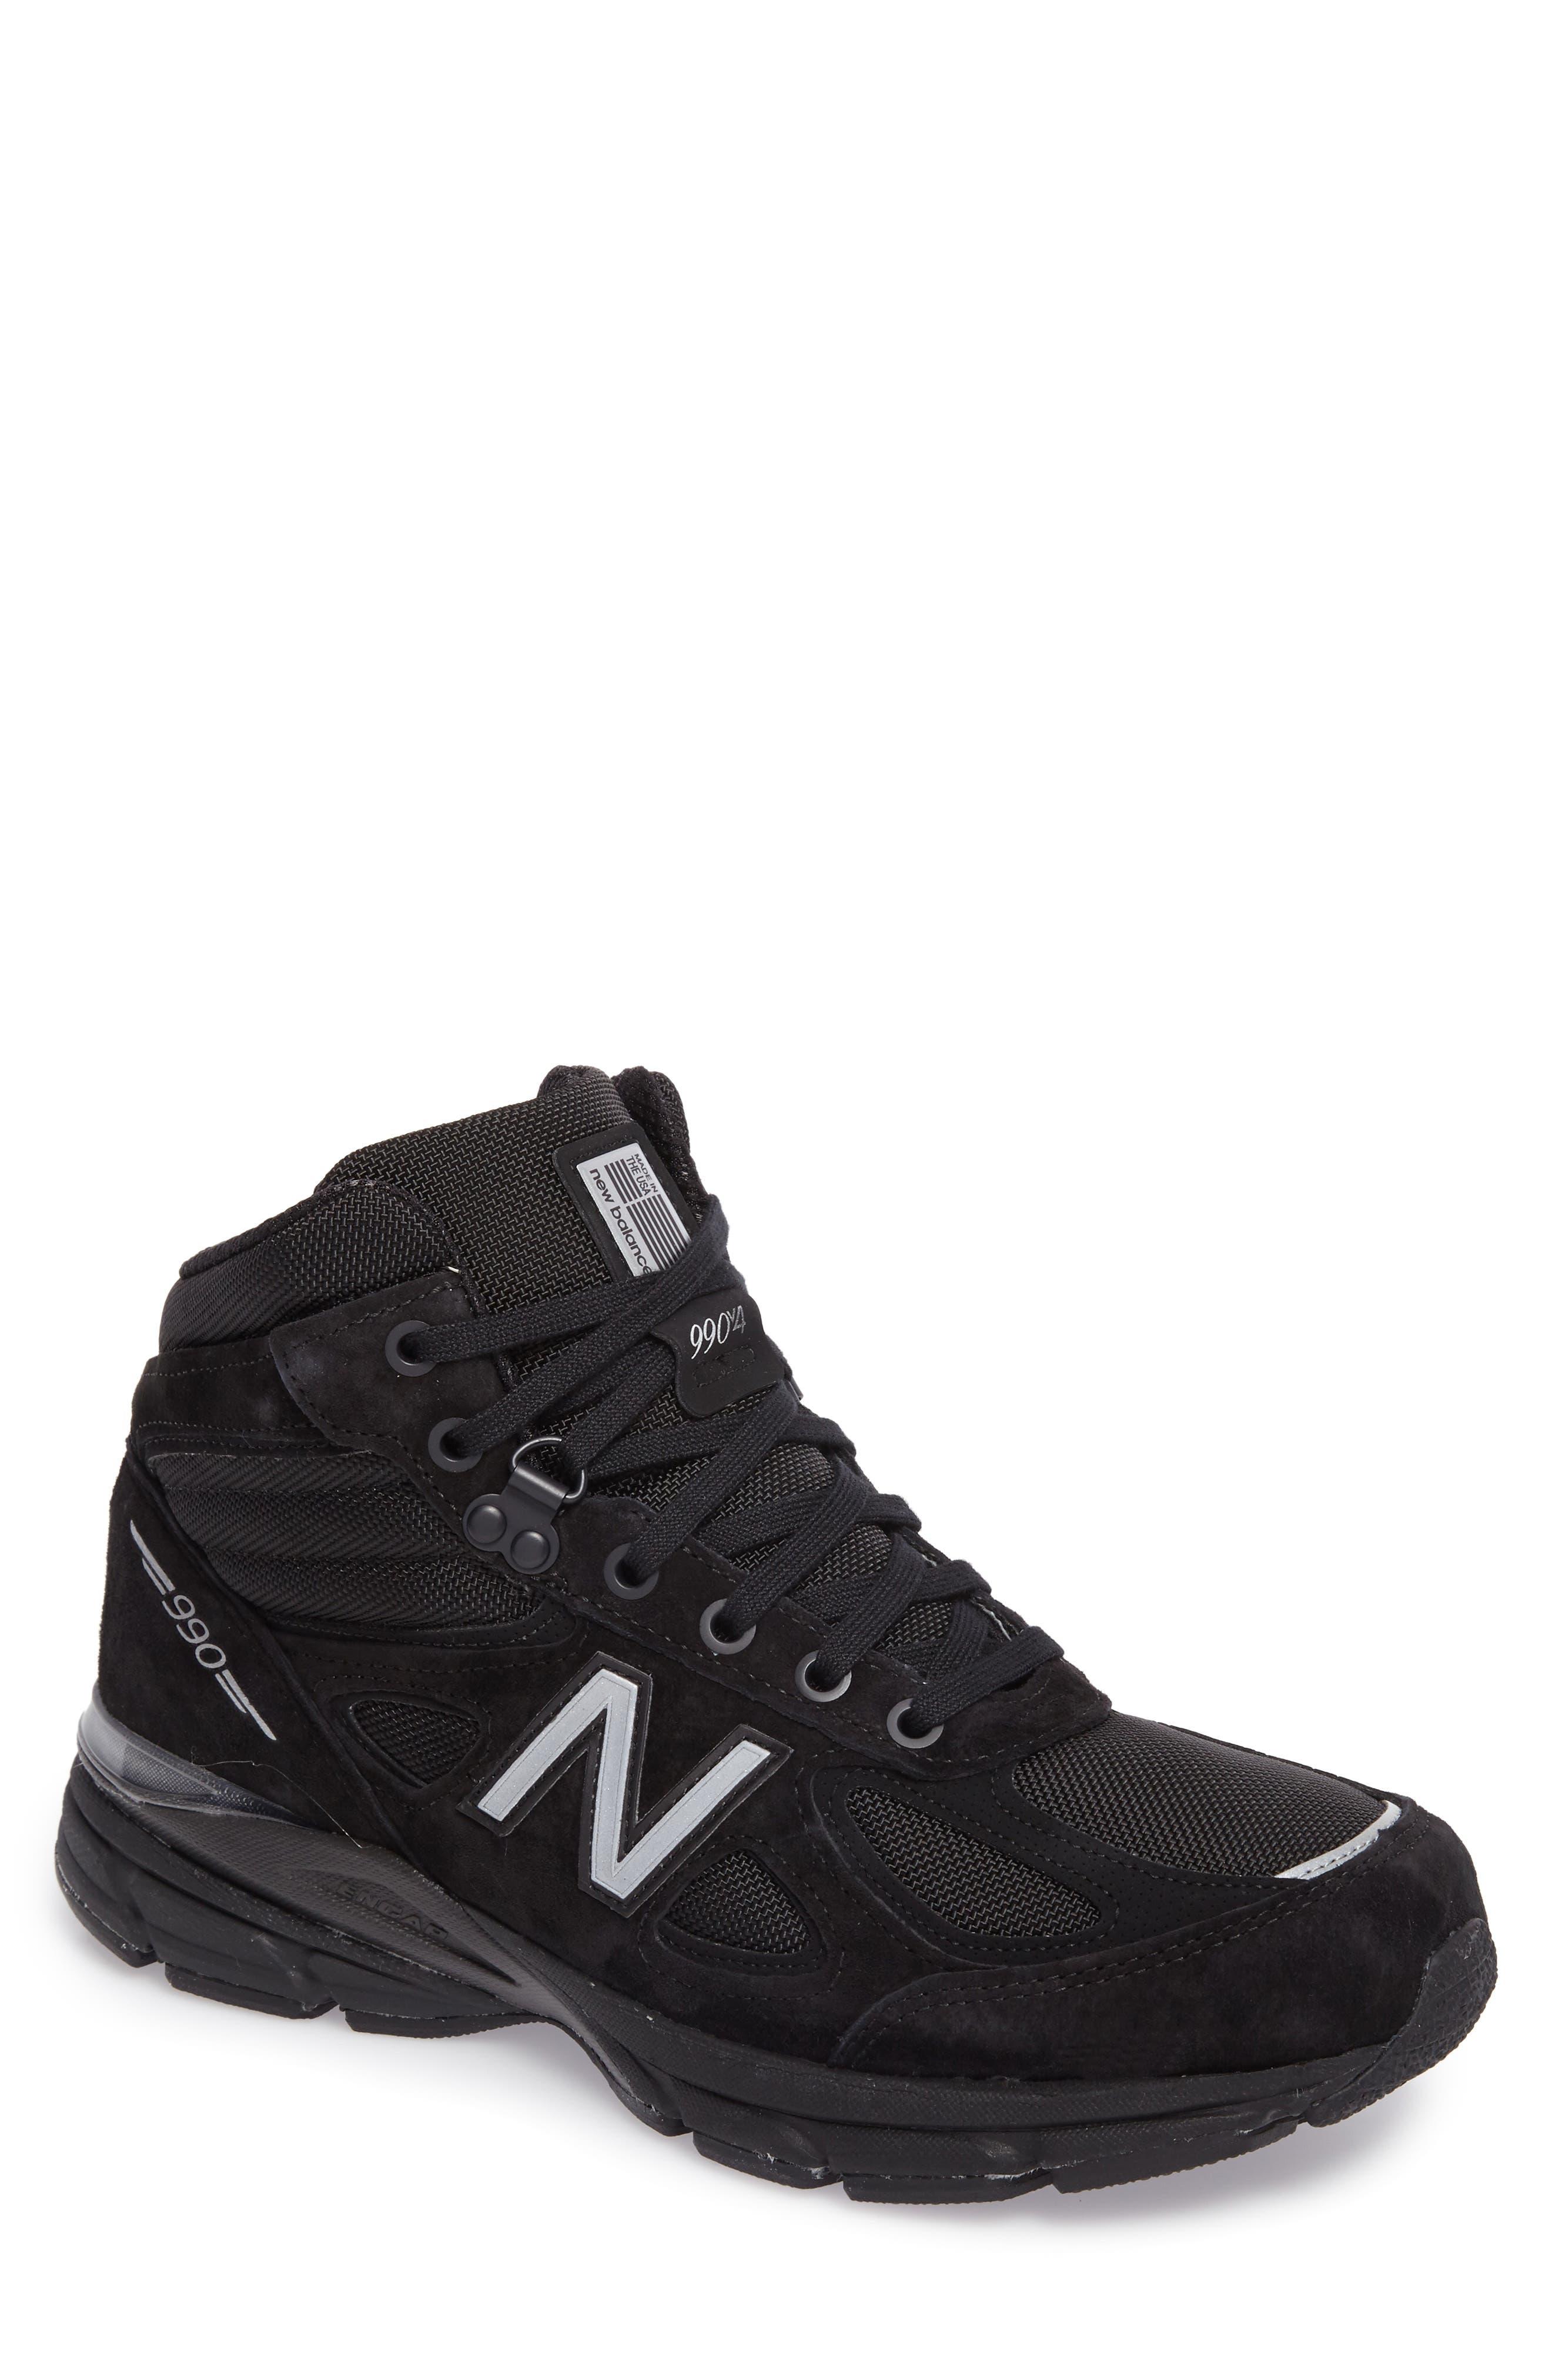 Alternate Image 1 Selected - New Balance 990v4 Water Resistant Sneaker Boot (Men)